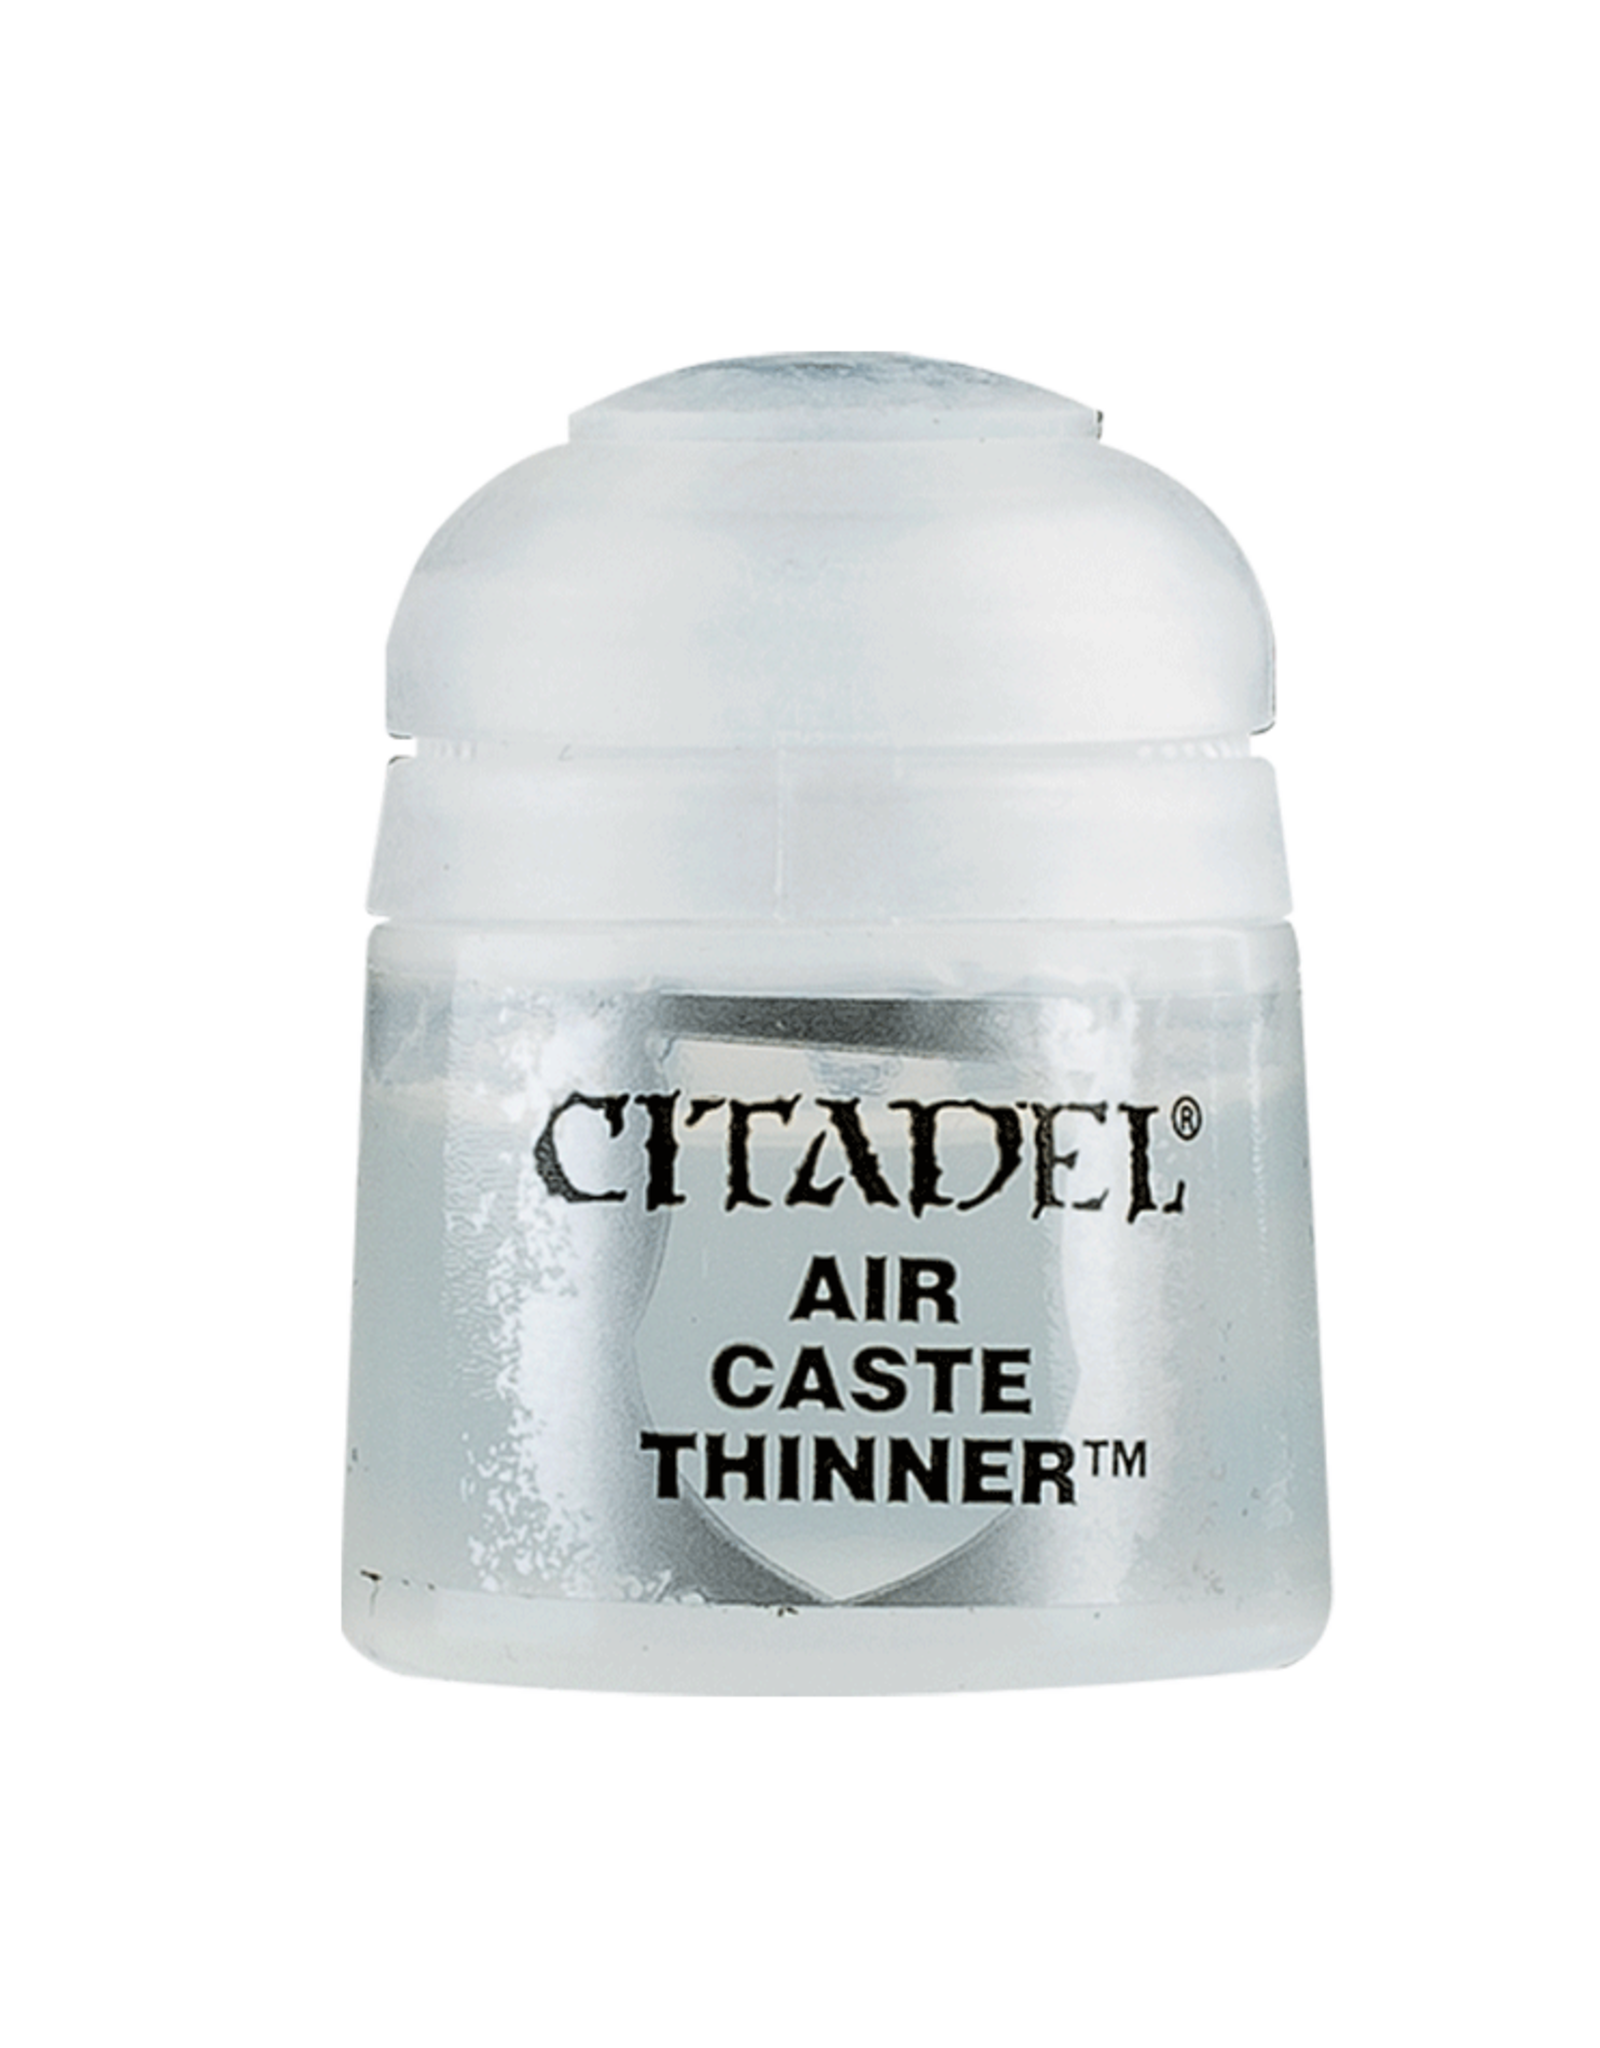 Citadel Citadel Air: Caste Thinner (24ml)